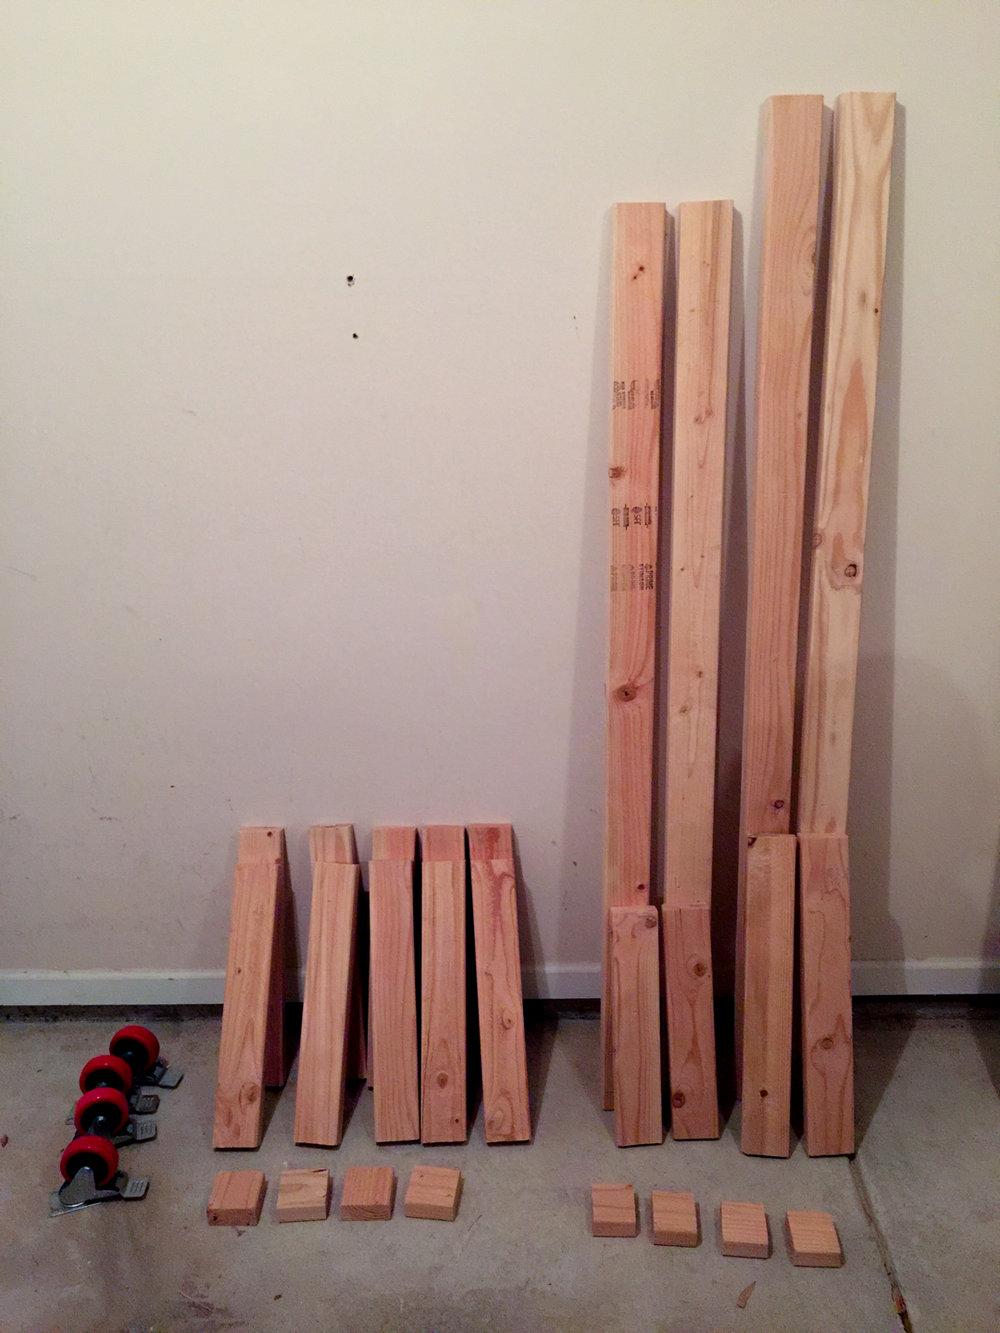 First Workbench - Rough cut 2x4s